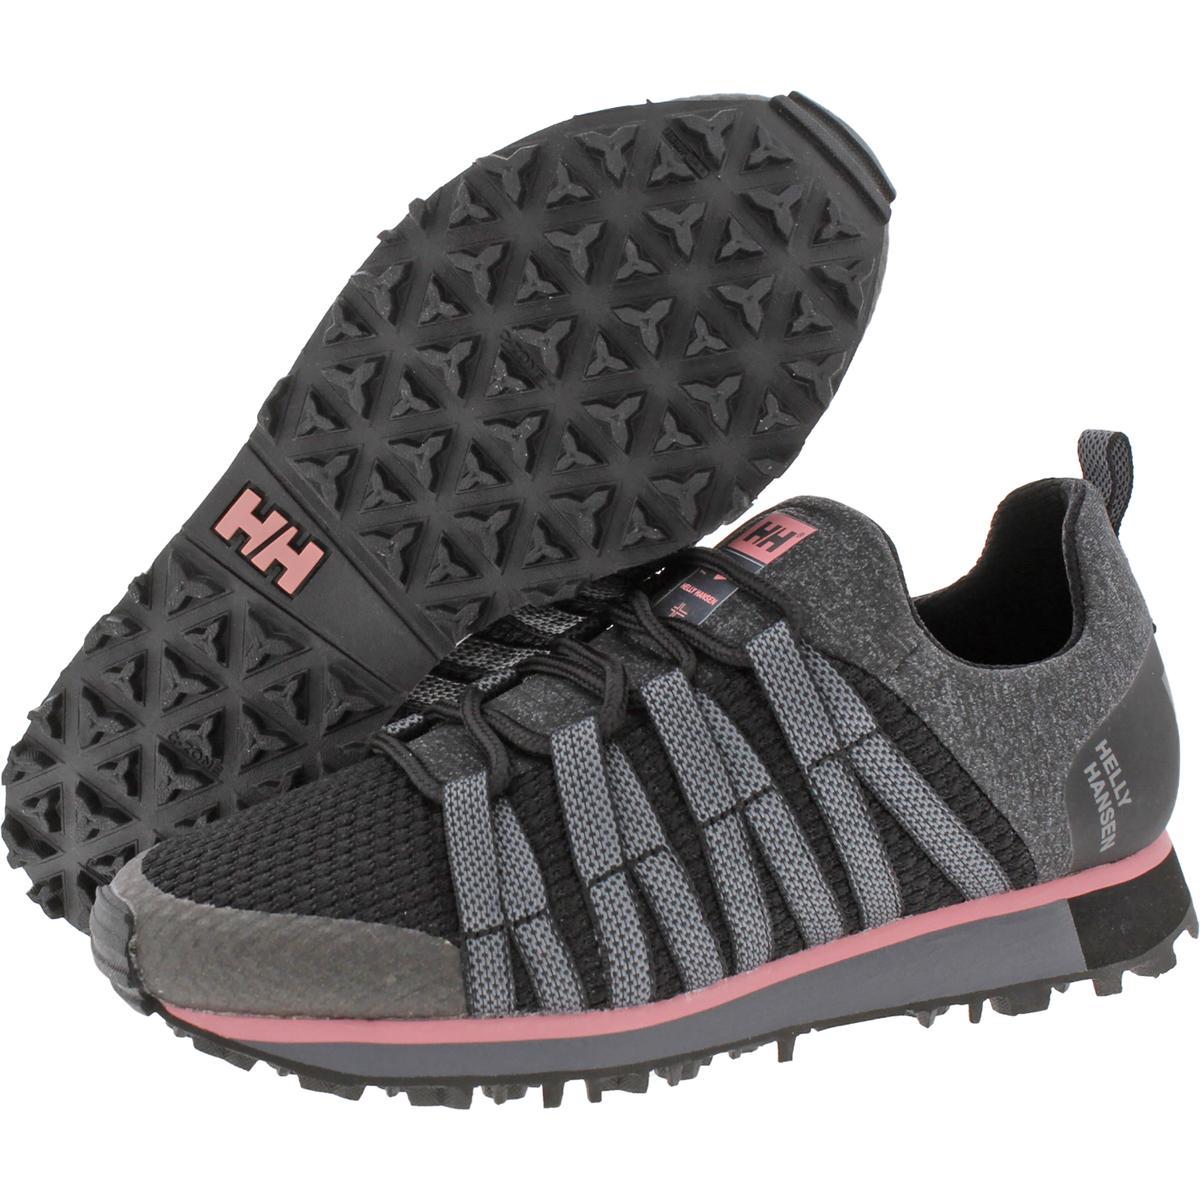 thumbnail 5 - Helly Hansen Womens Vardapeak V2 Fitness Performance Sneakers Shoes BHFO 9846